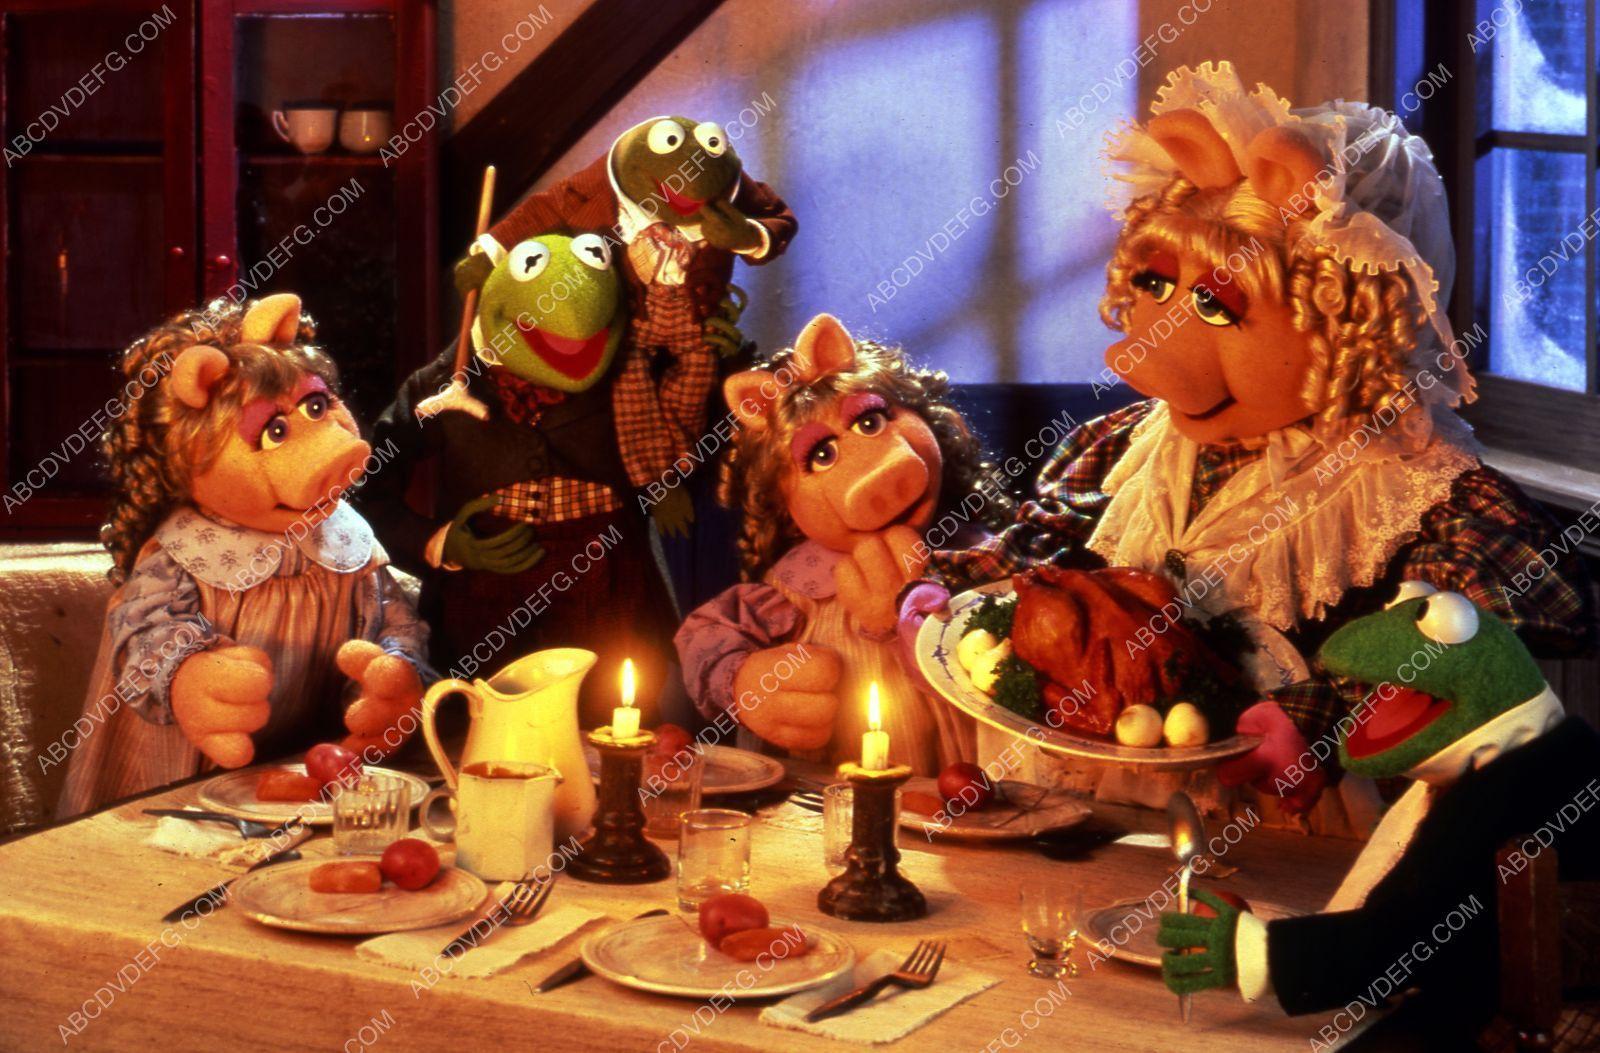 Miss Piggy Kermit the Frog film The Muppets Christmas Carol 35m-7062 ...